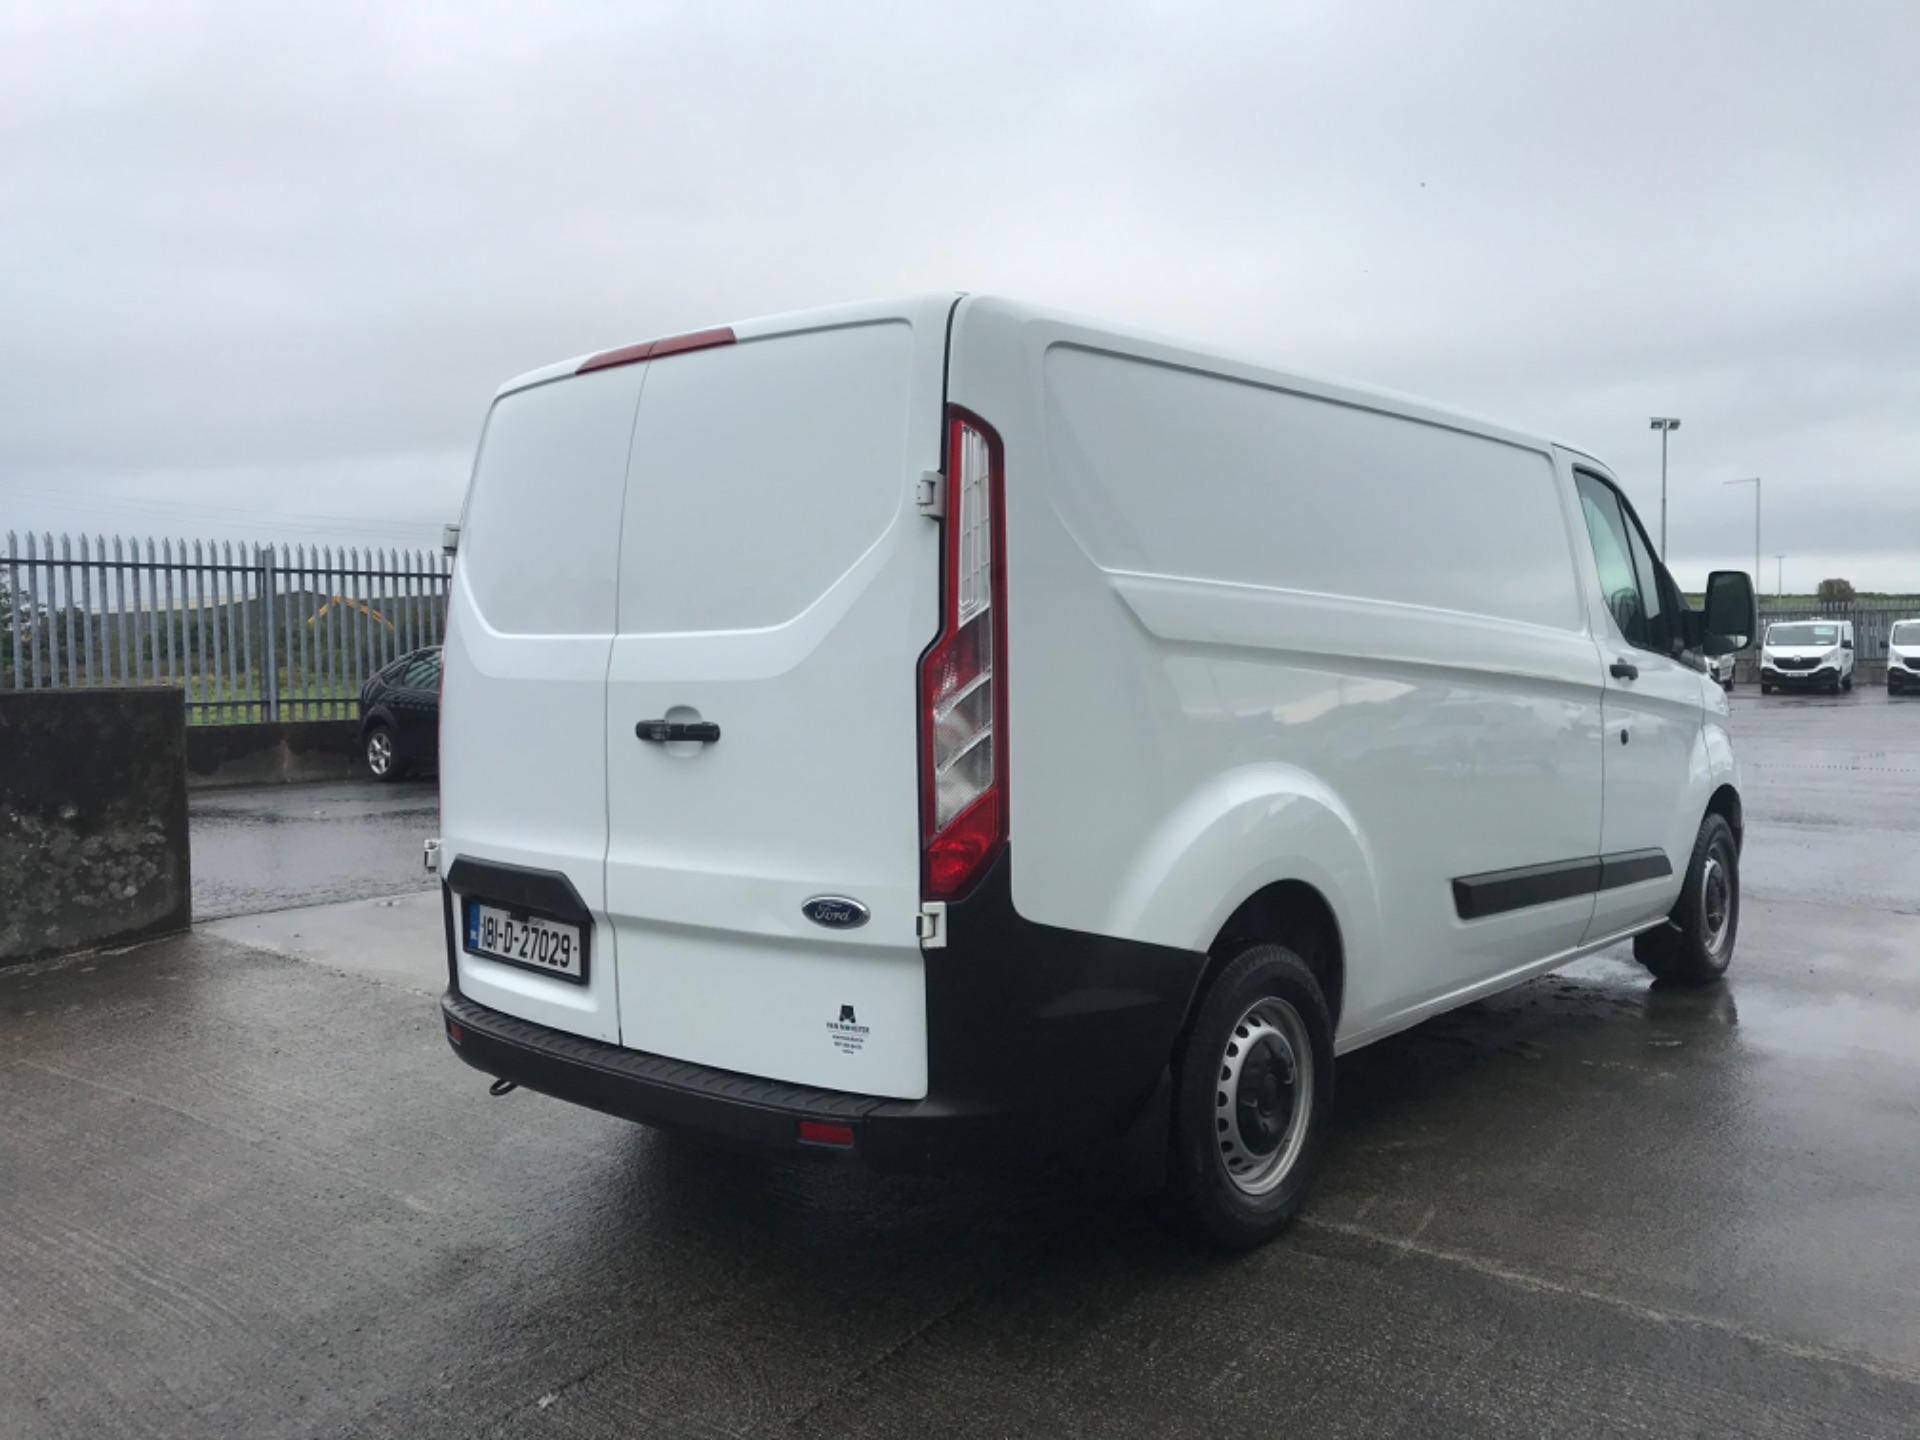 2018 Ford Transit Custom Custom 300 Lbase 2.0 105PS 3DR (181D27029) Image 5